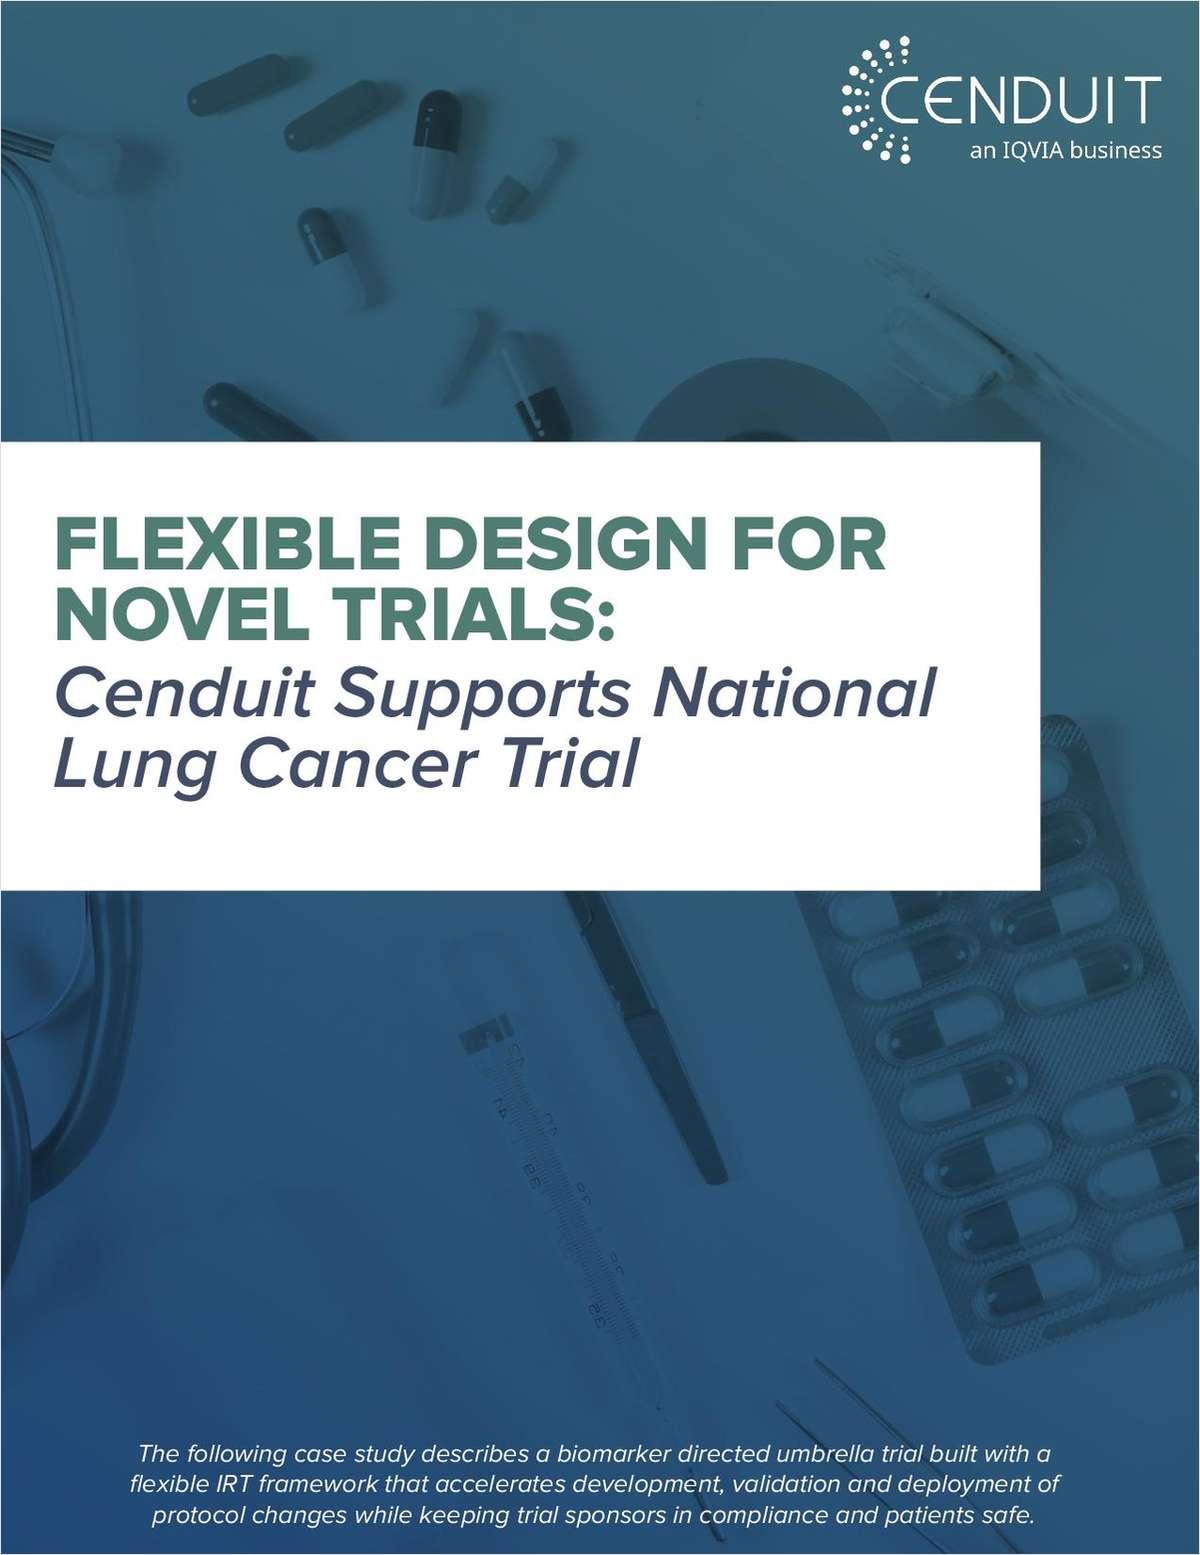 Flexible Design for Novel Trials